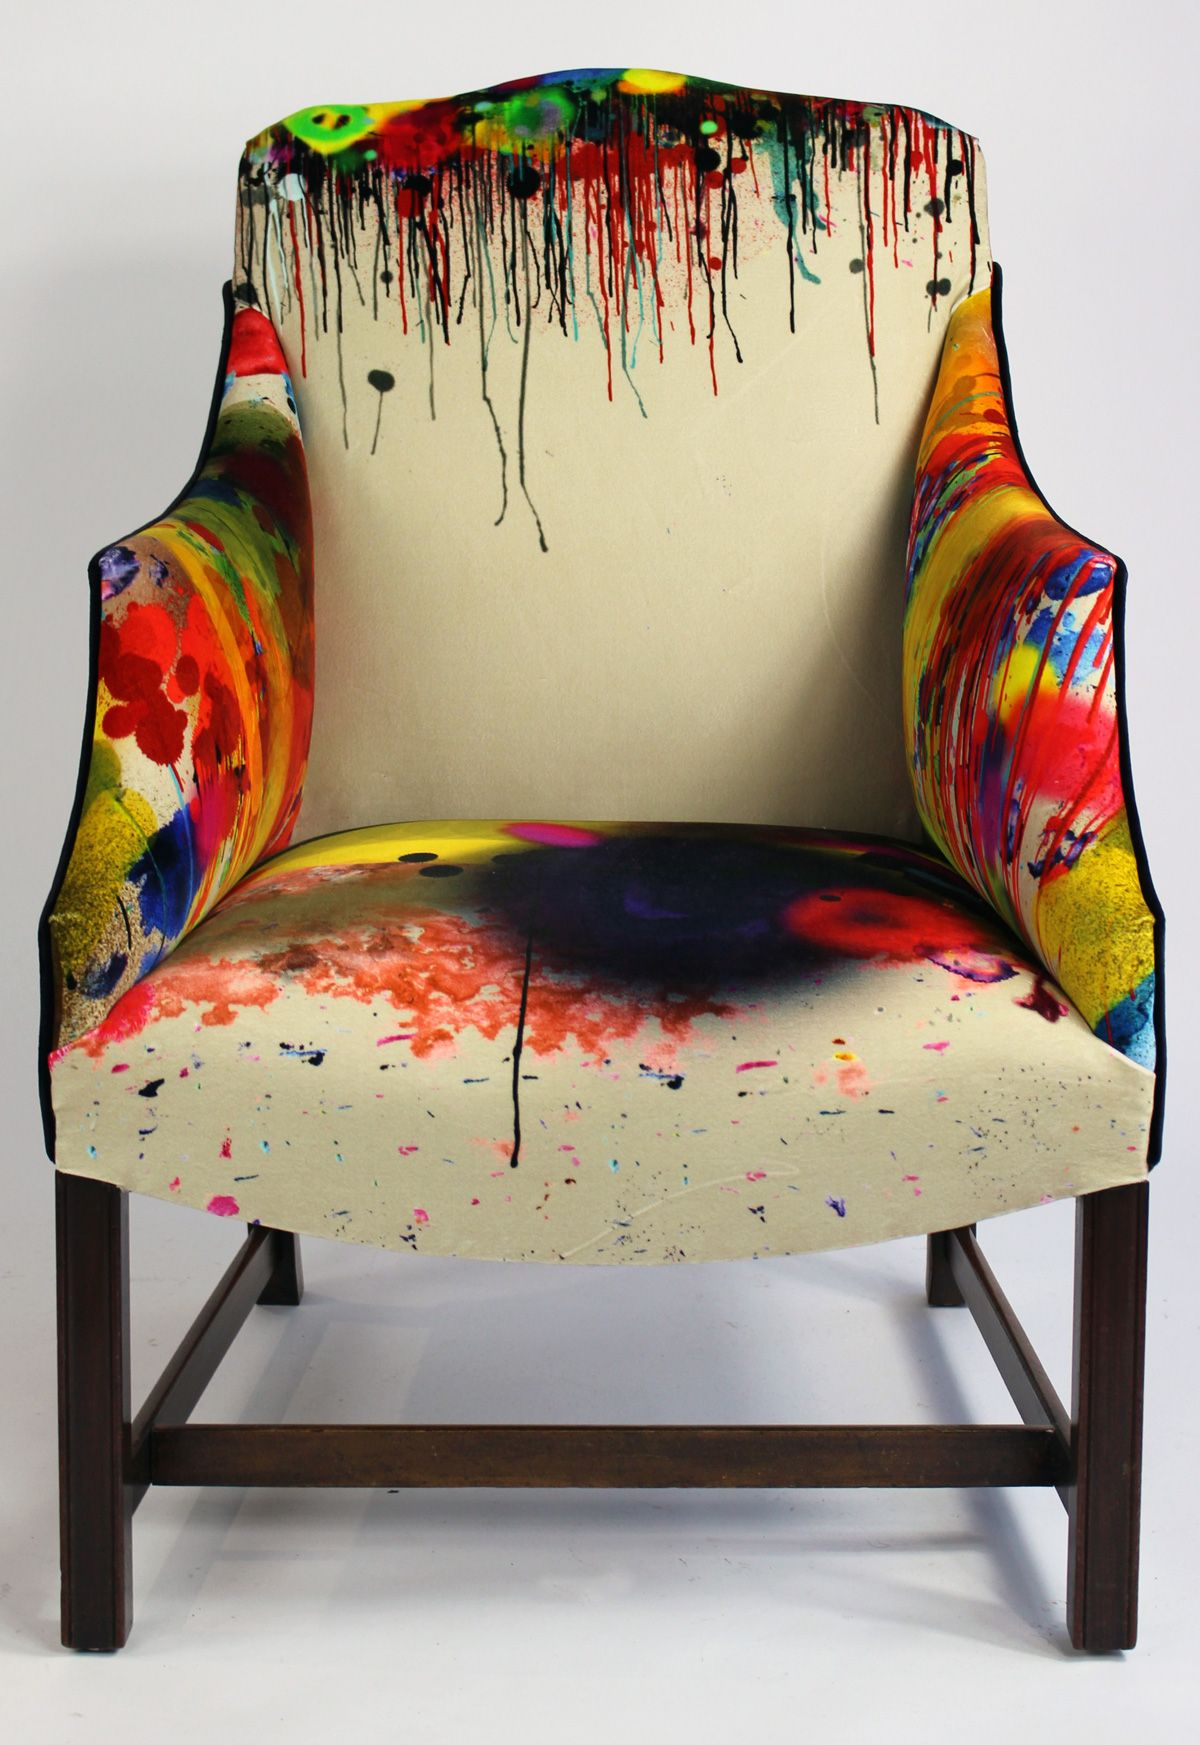 Furniture Timorous Beasties רהיטים In 2019